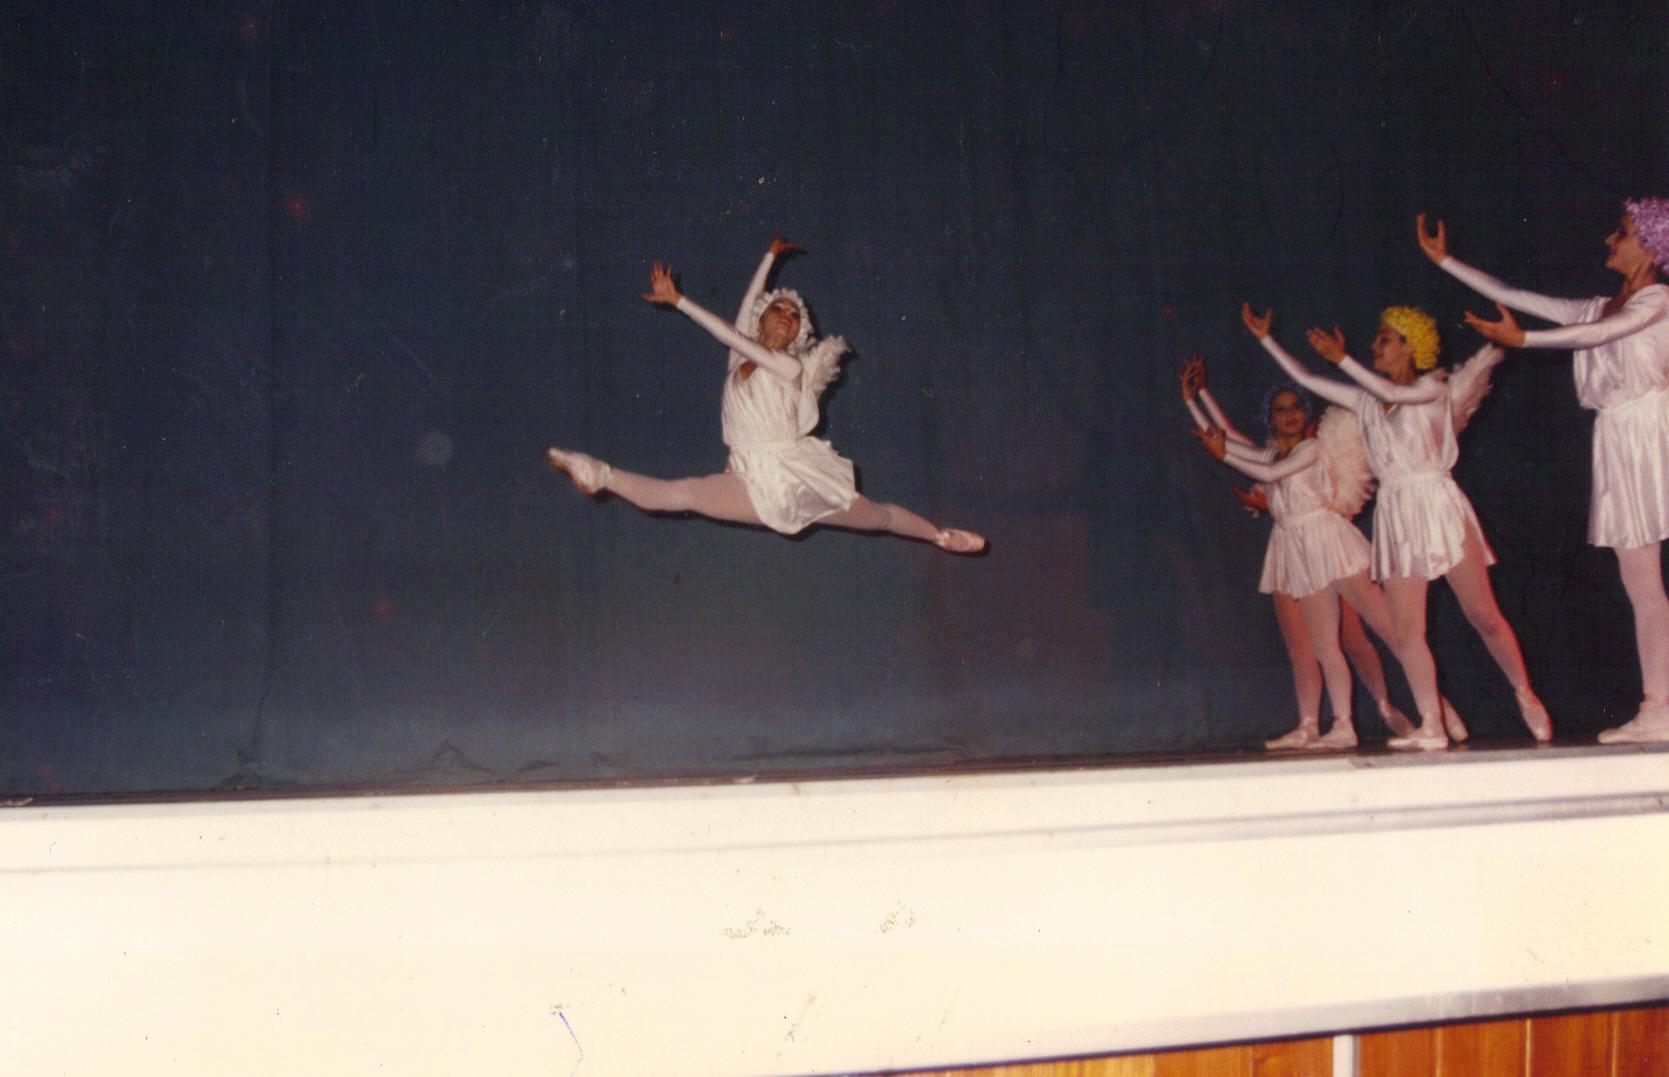 Anjos - 1993